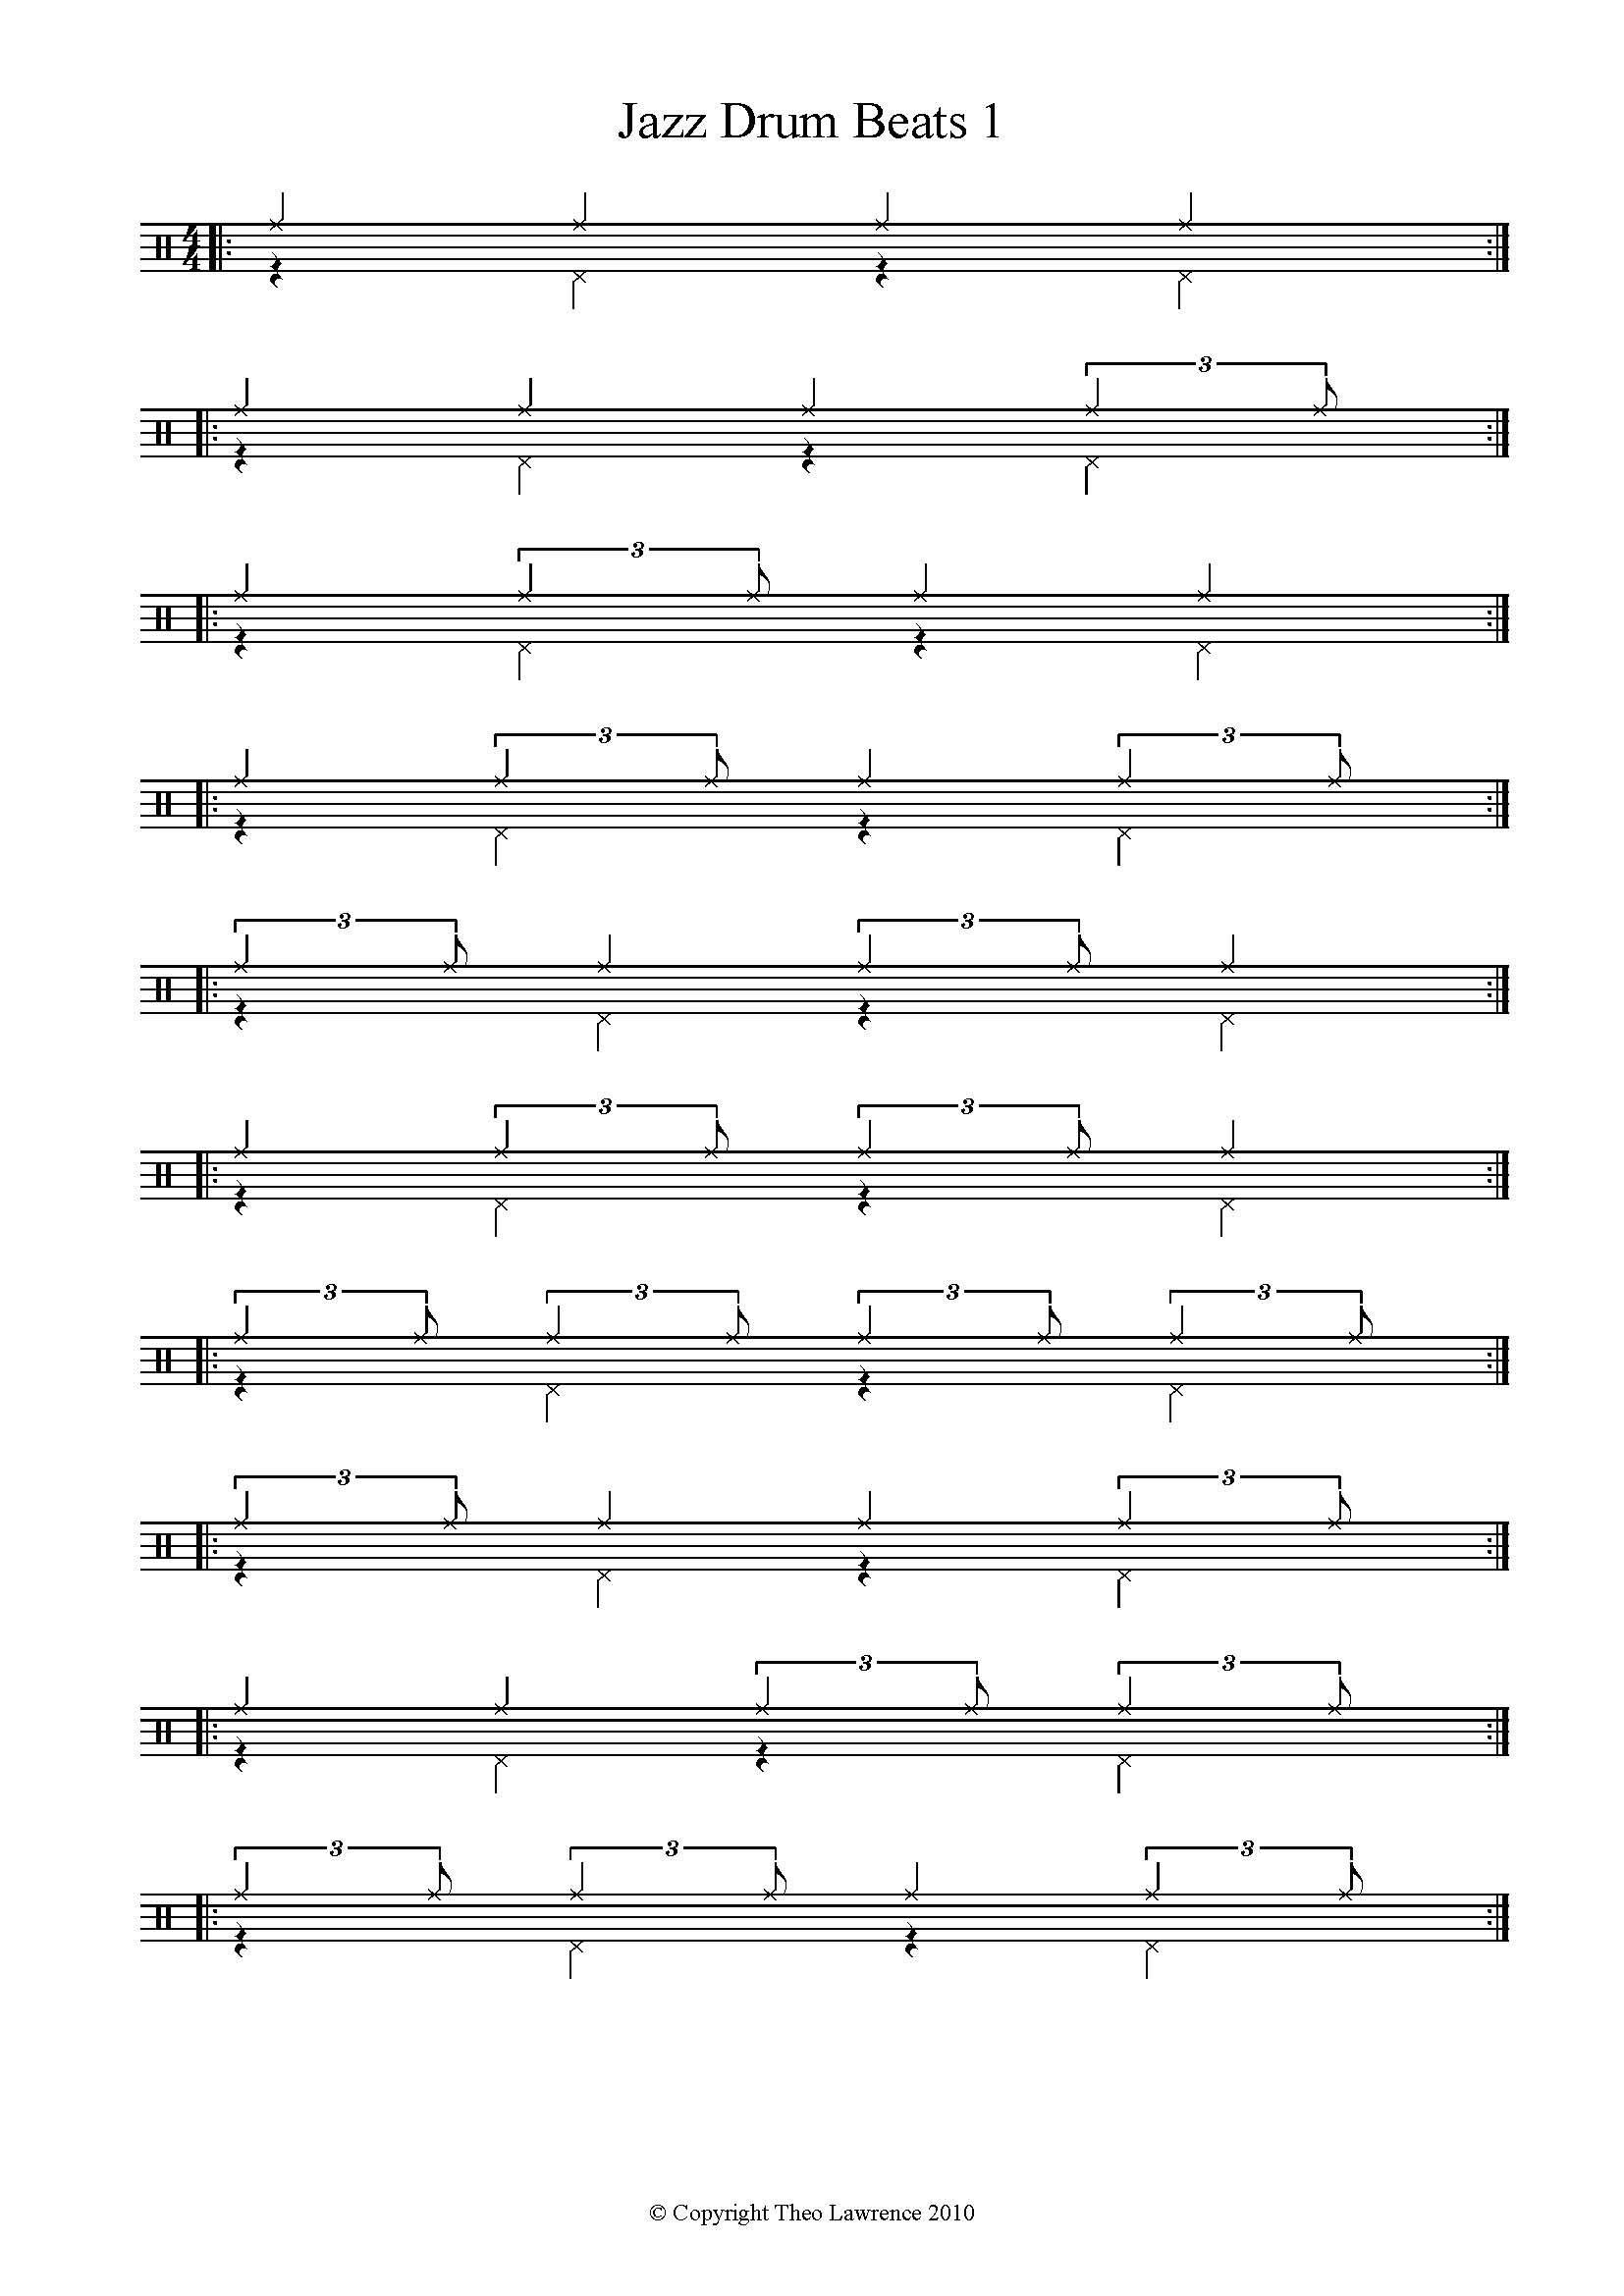 basic jazz drum patterns drum lessons drums drum sheet music drum patterns. Black Bedroom Furniture Sets. Home Design Ideas